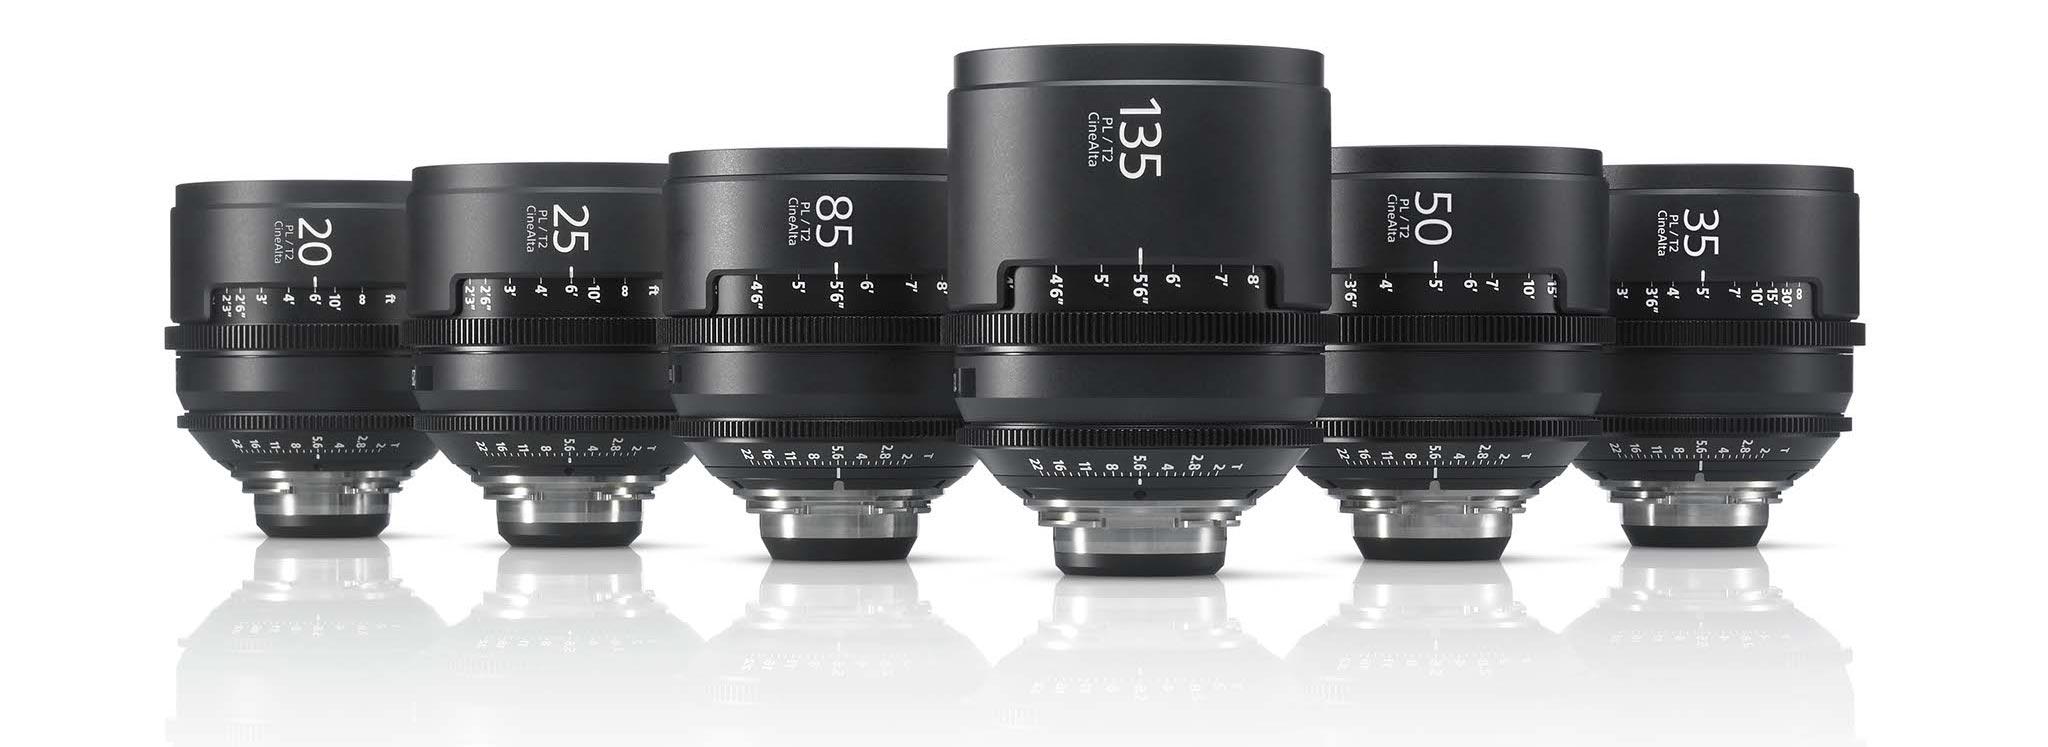 Sony-new-PL-mount-prime-lenses